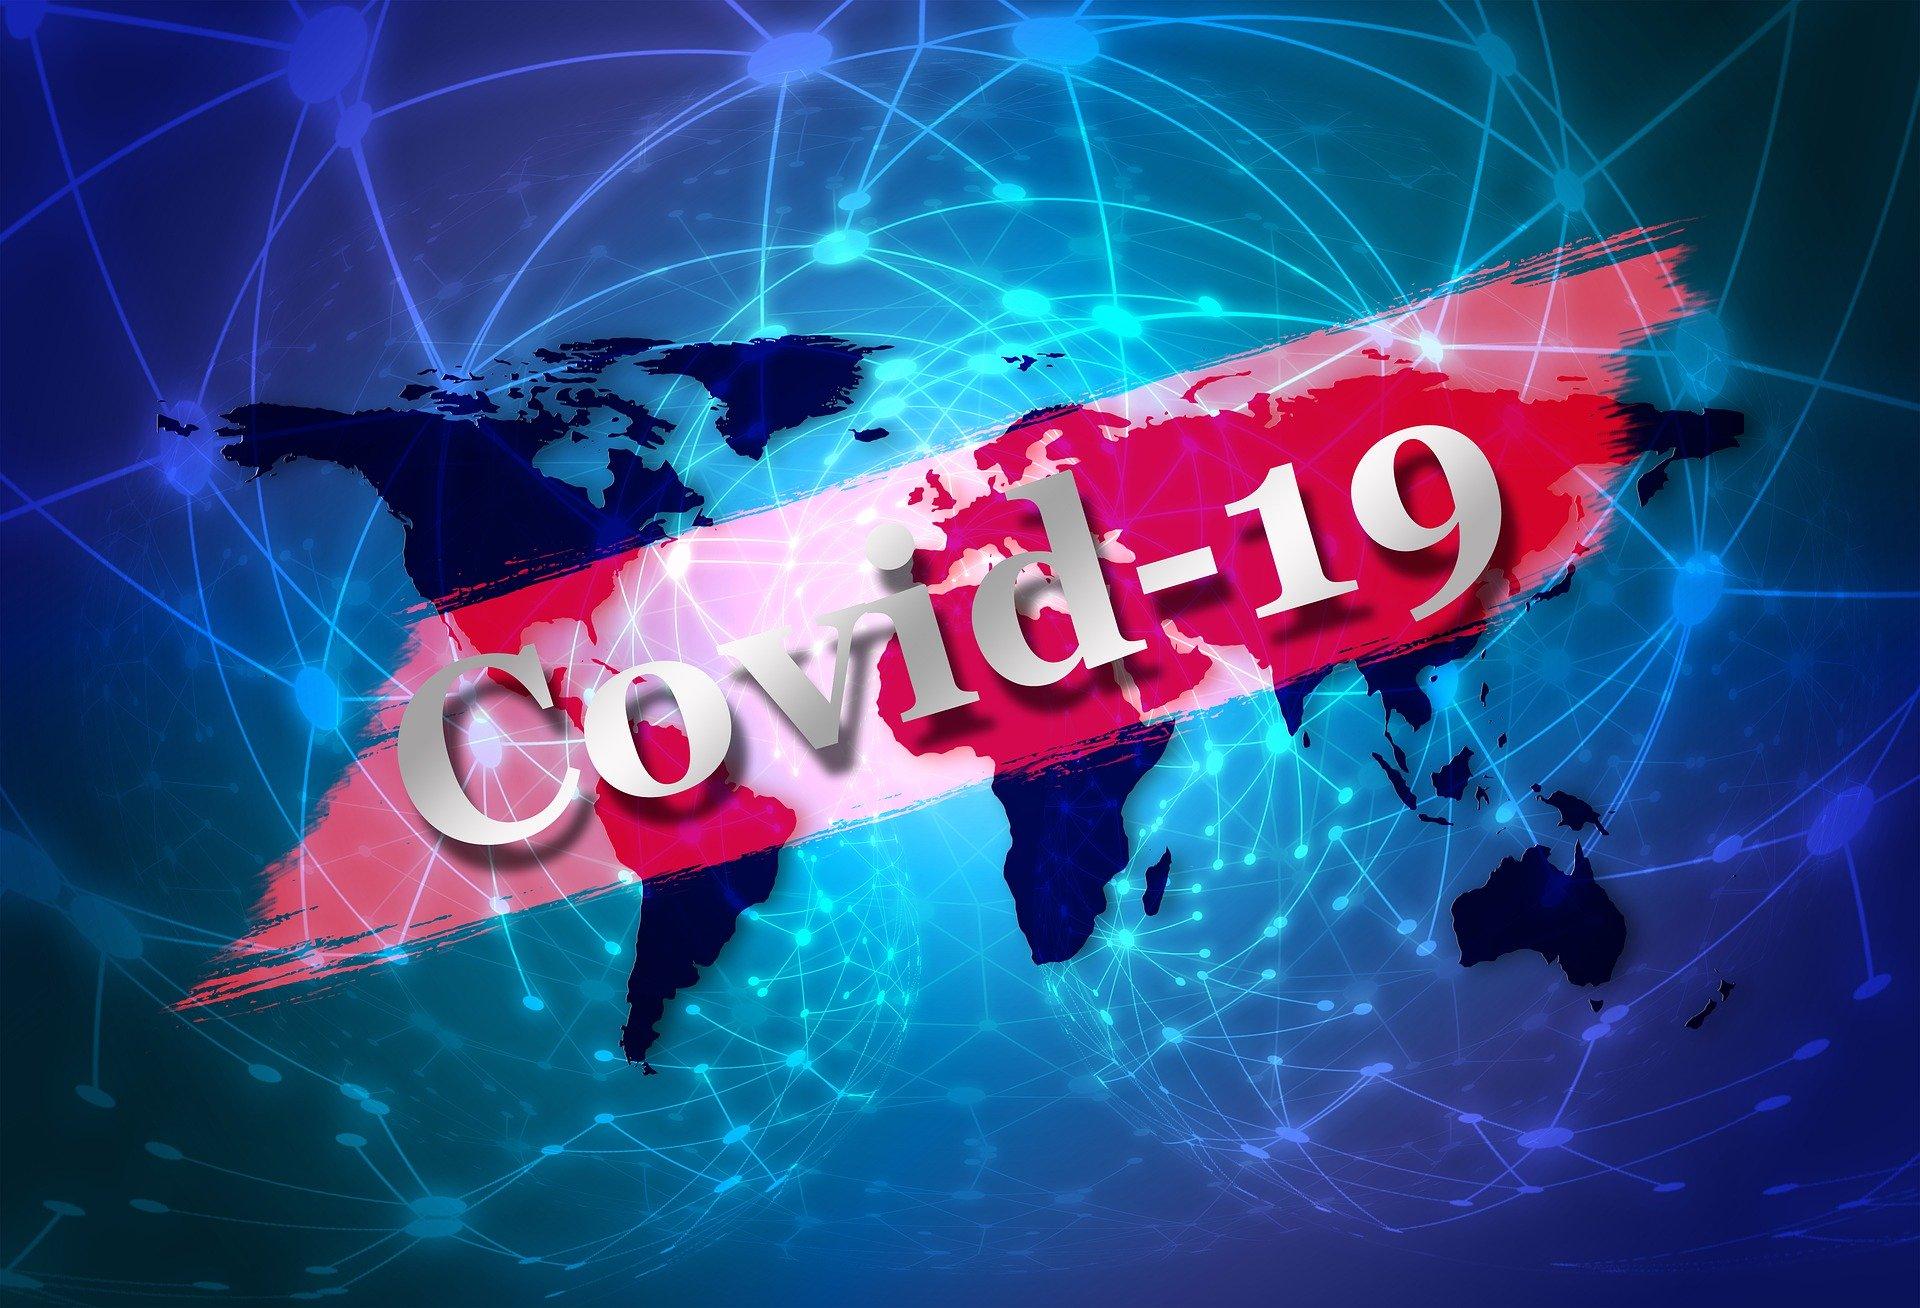 coronavirus avvocato brescia